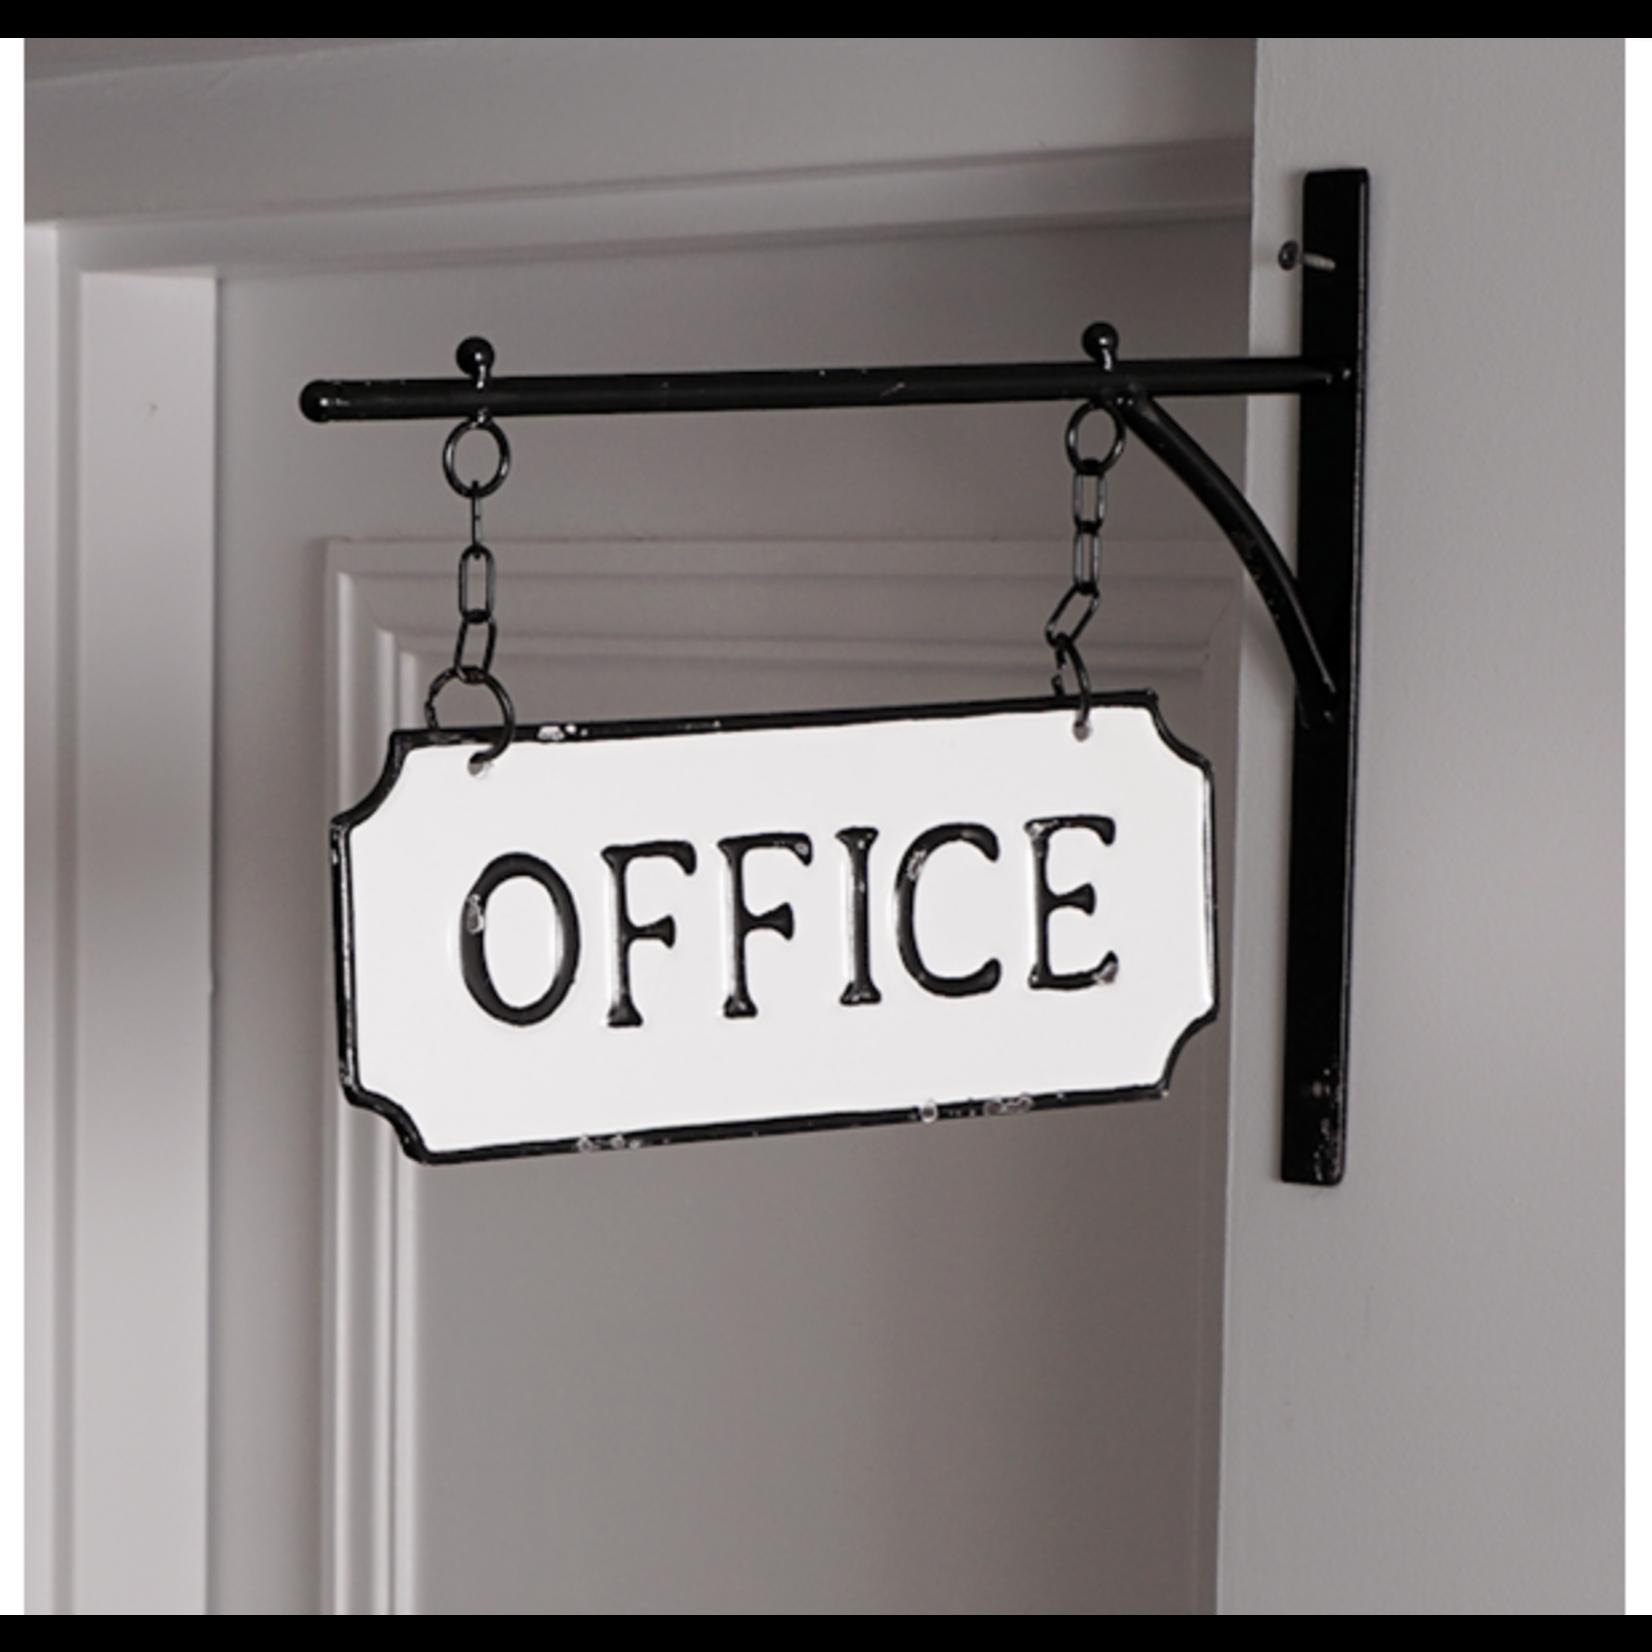 Wall Office Hanger